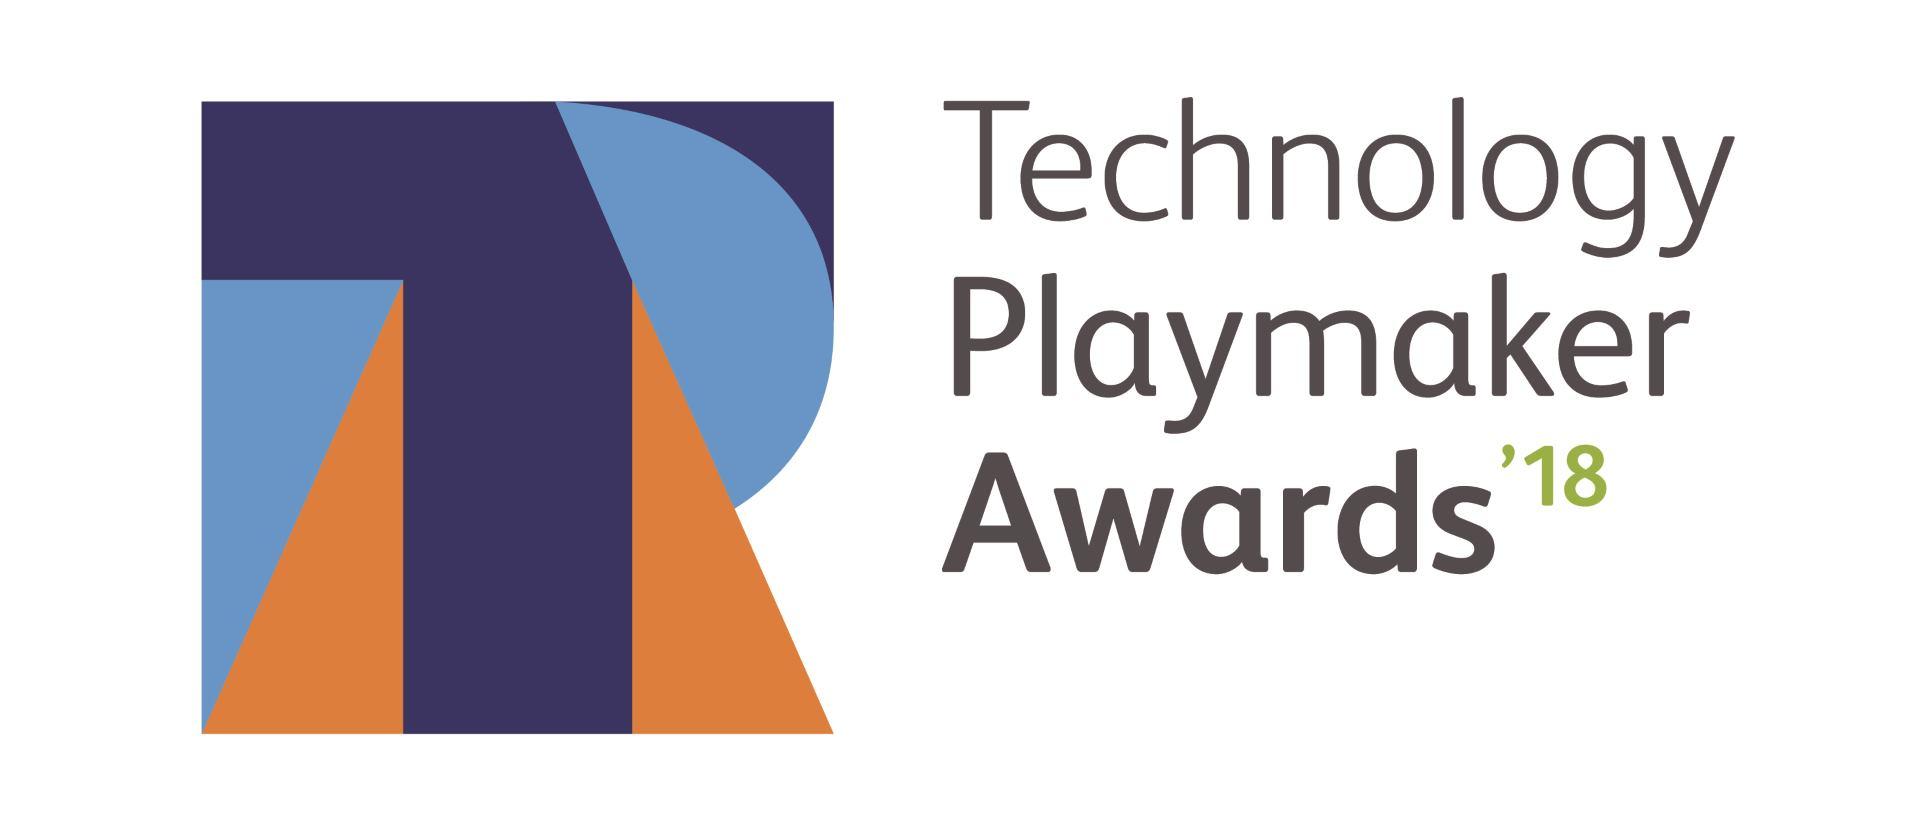 BOOKING.COM Finalistice prve dodjele Technology Playmaker Awards